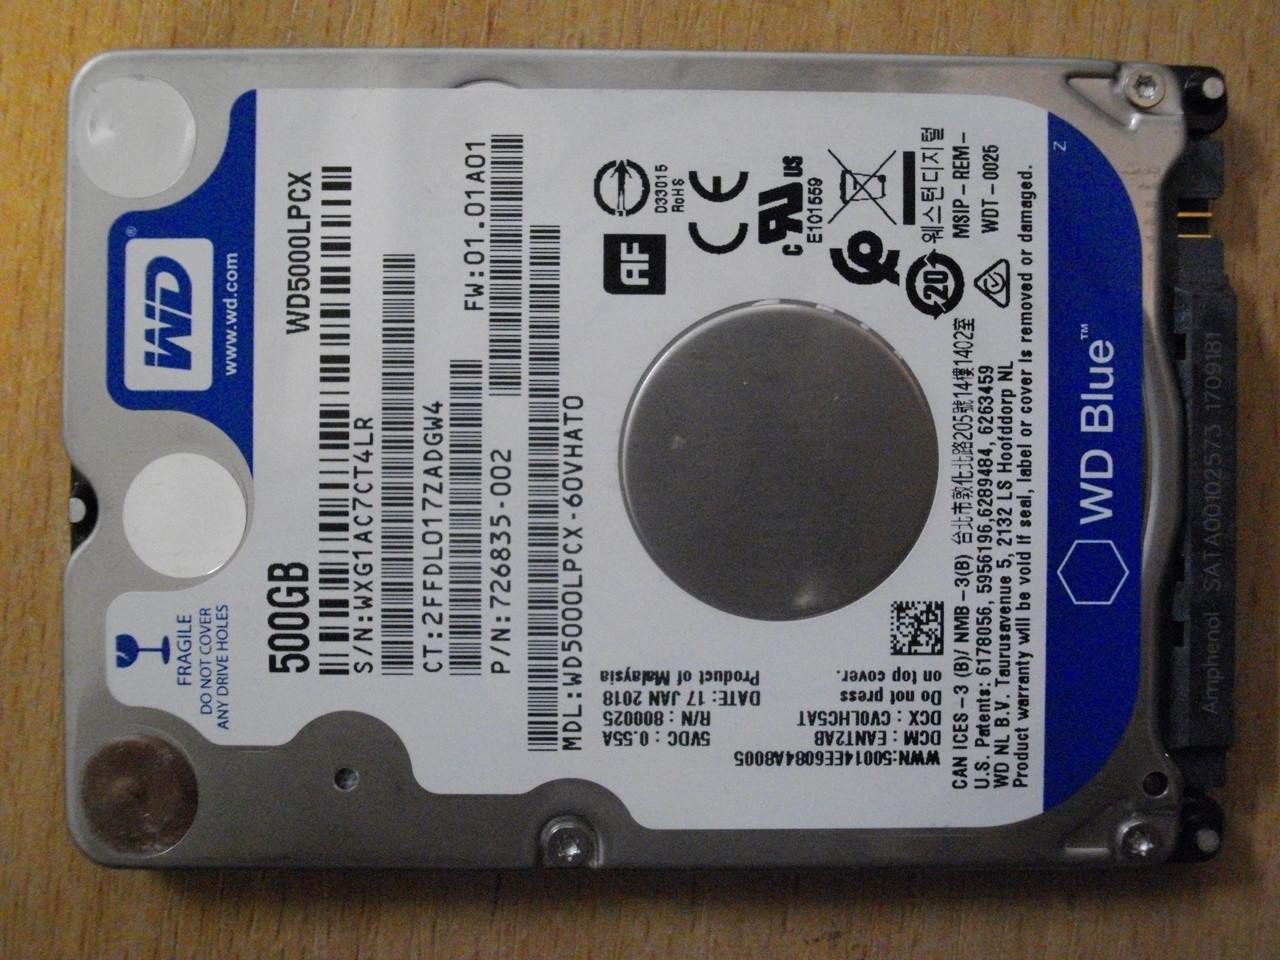 HDD Жесткий диск WD 500GB WD5000LPCX SATA БУ Хорошее состояние.